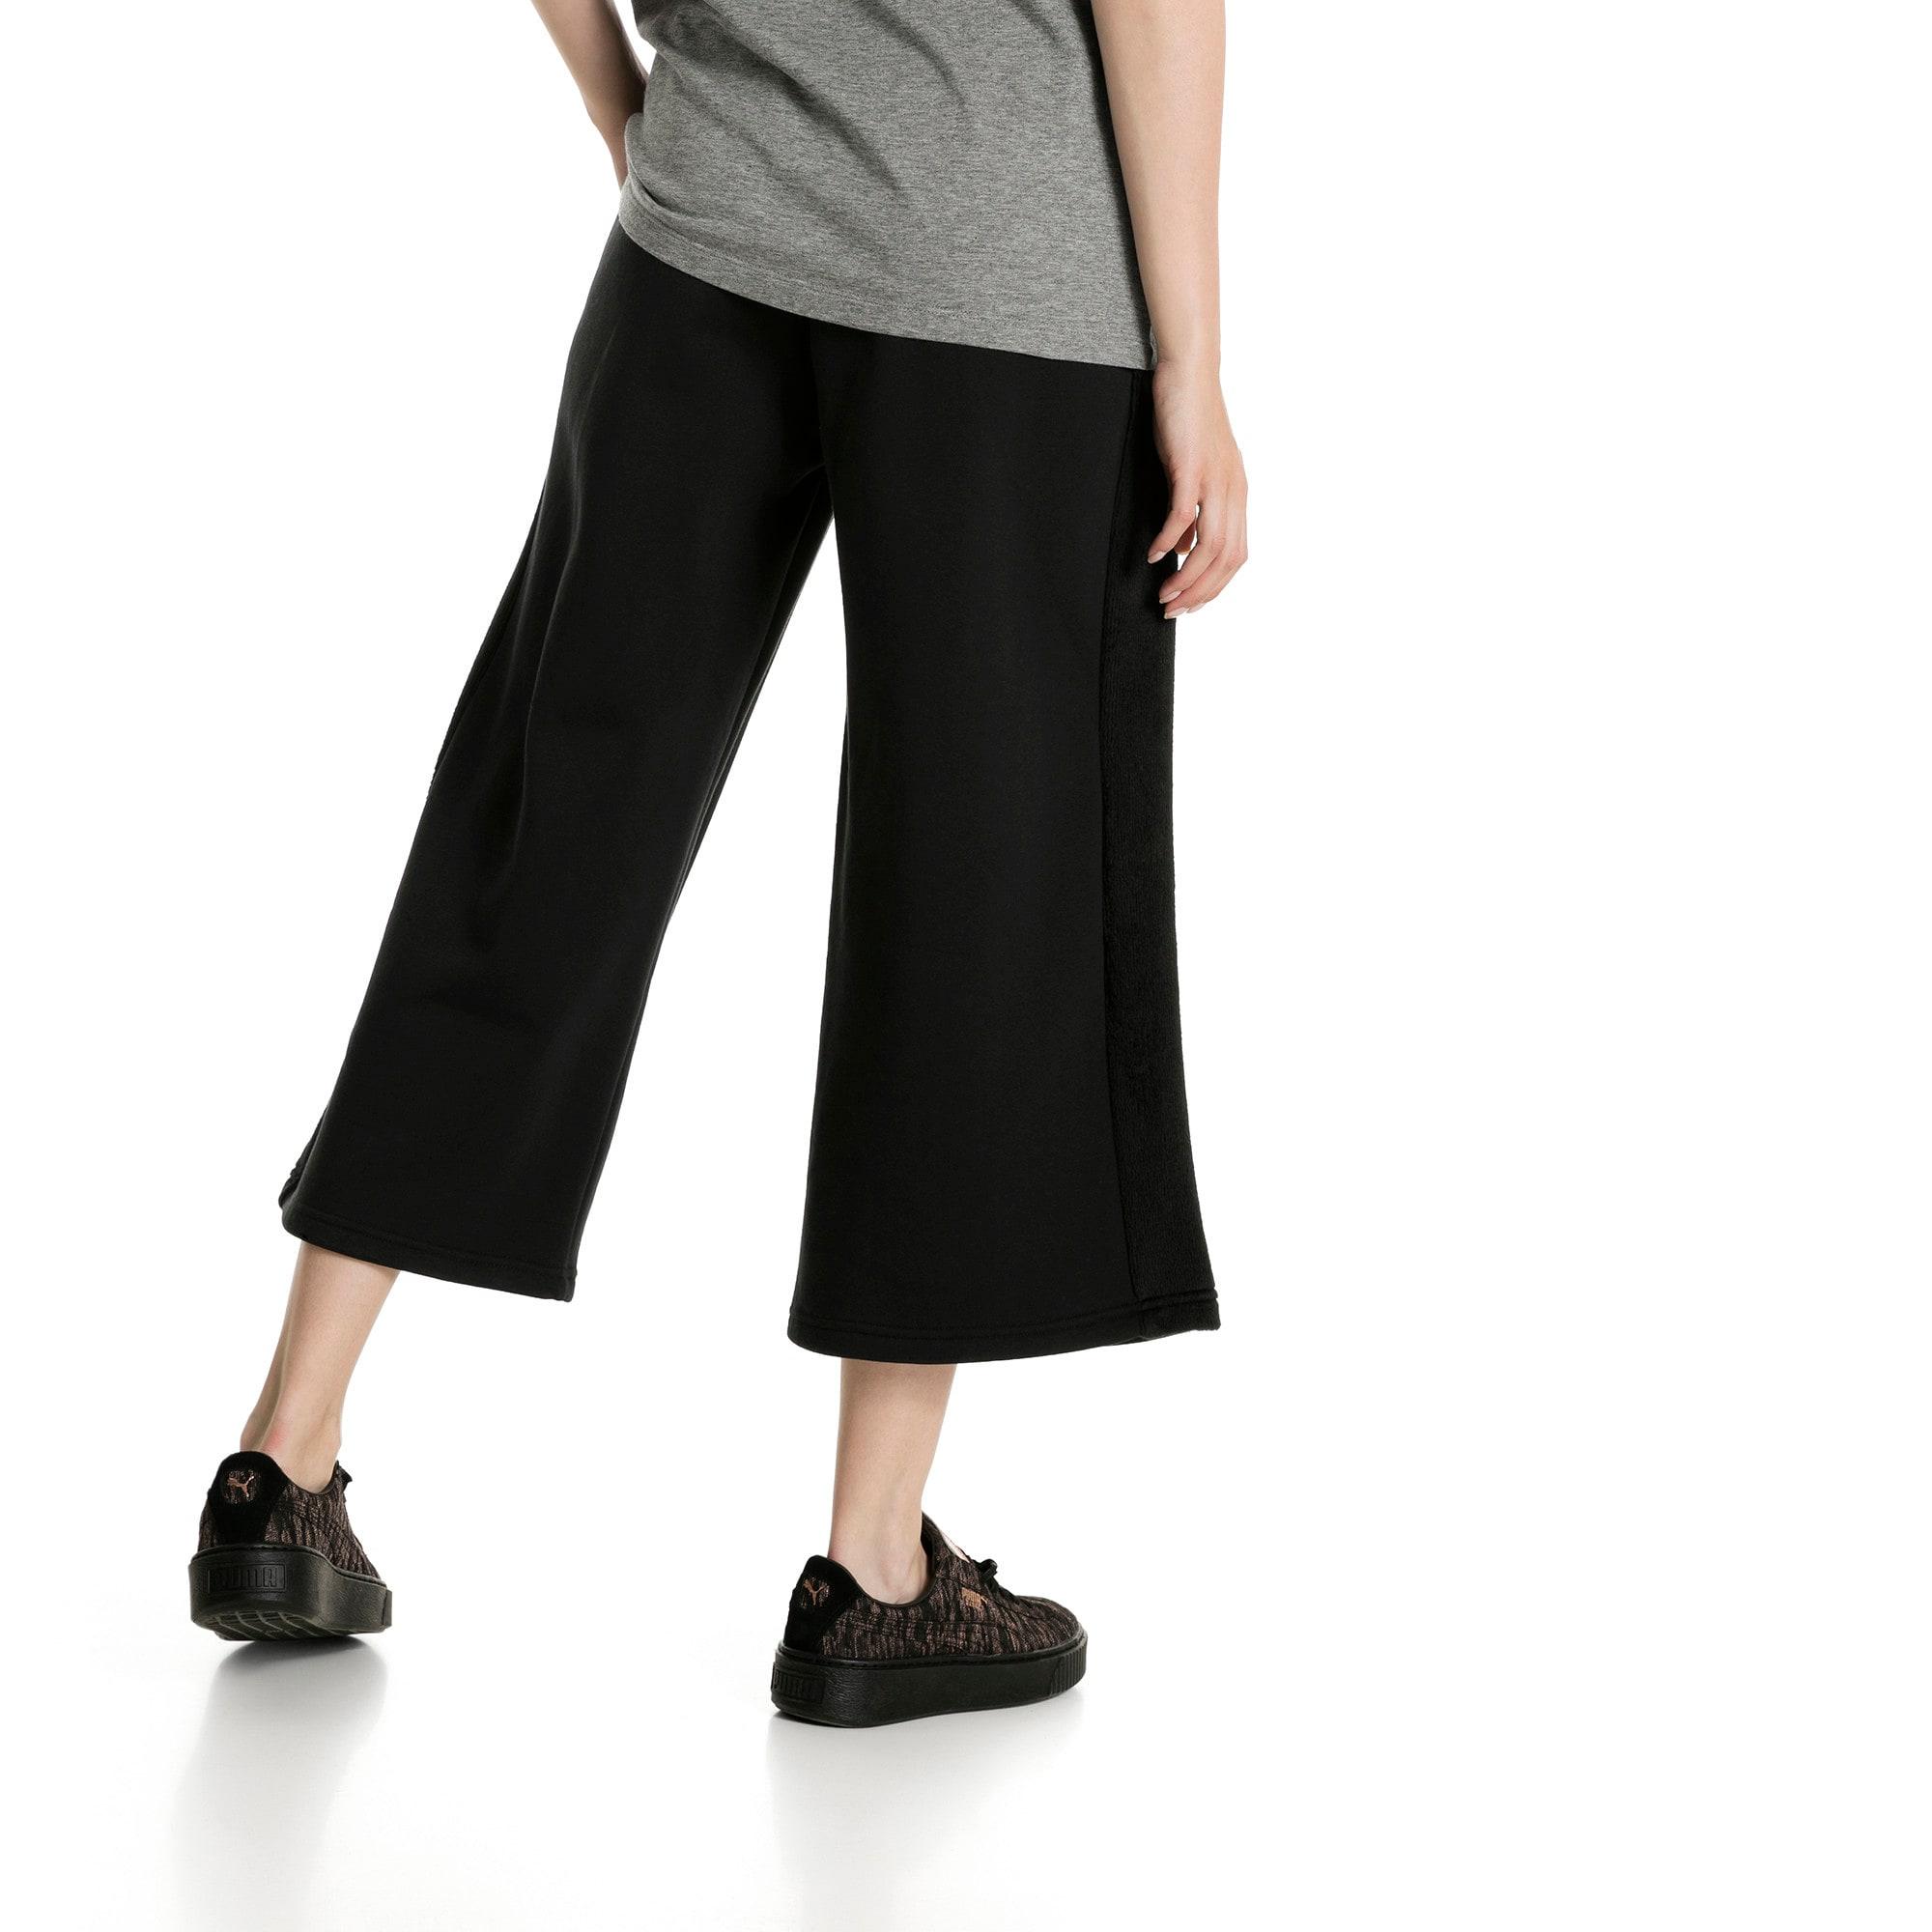 Thumbnail 3 of Classics Women's Winterized Archive Logo T7 Pants, Cotton Black, medium-IND